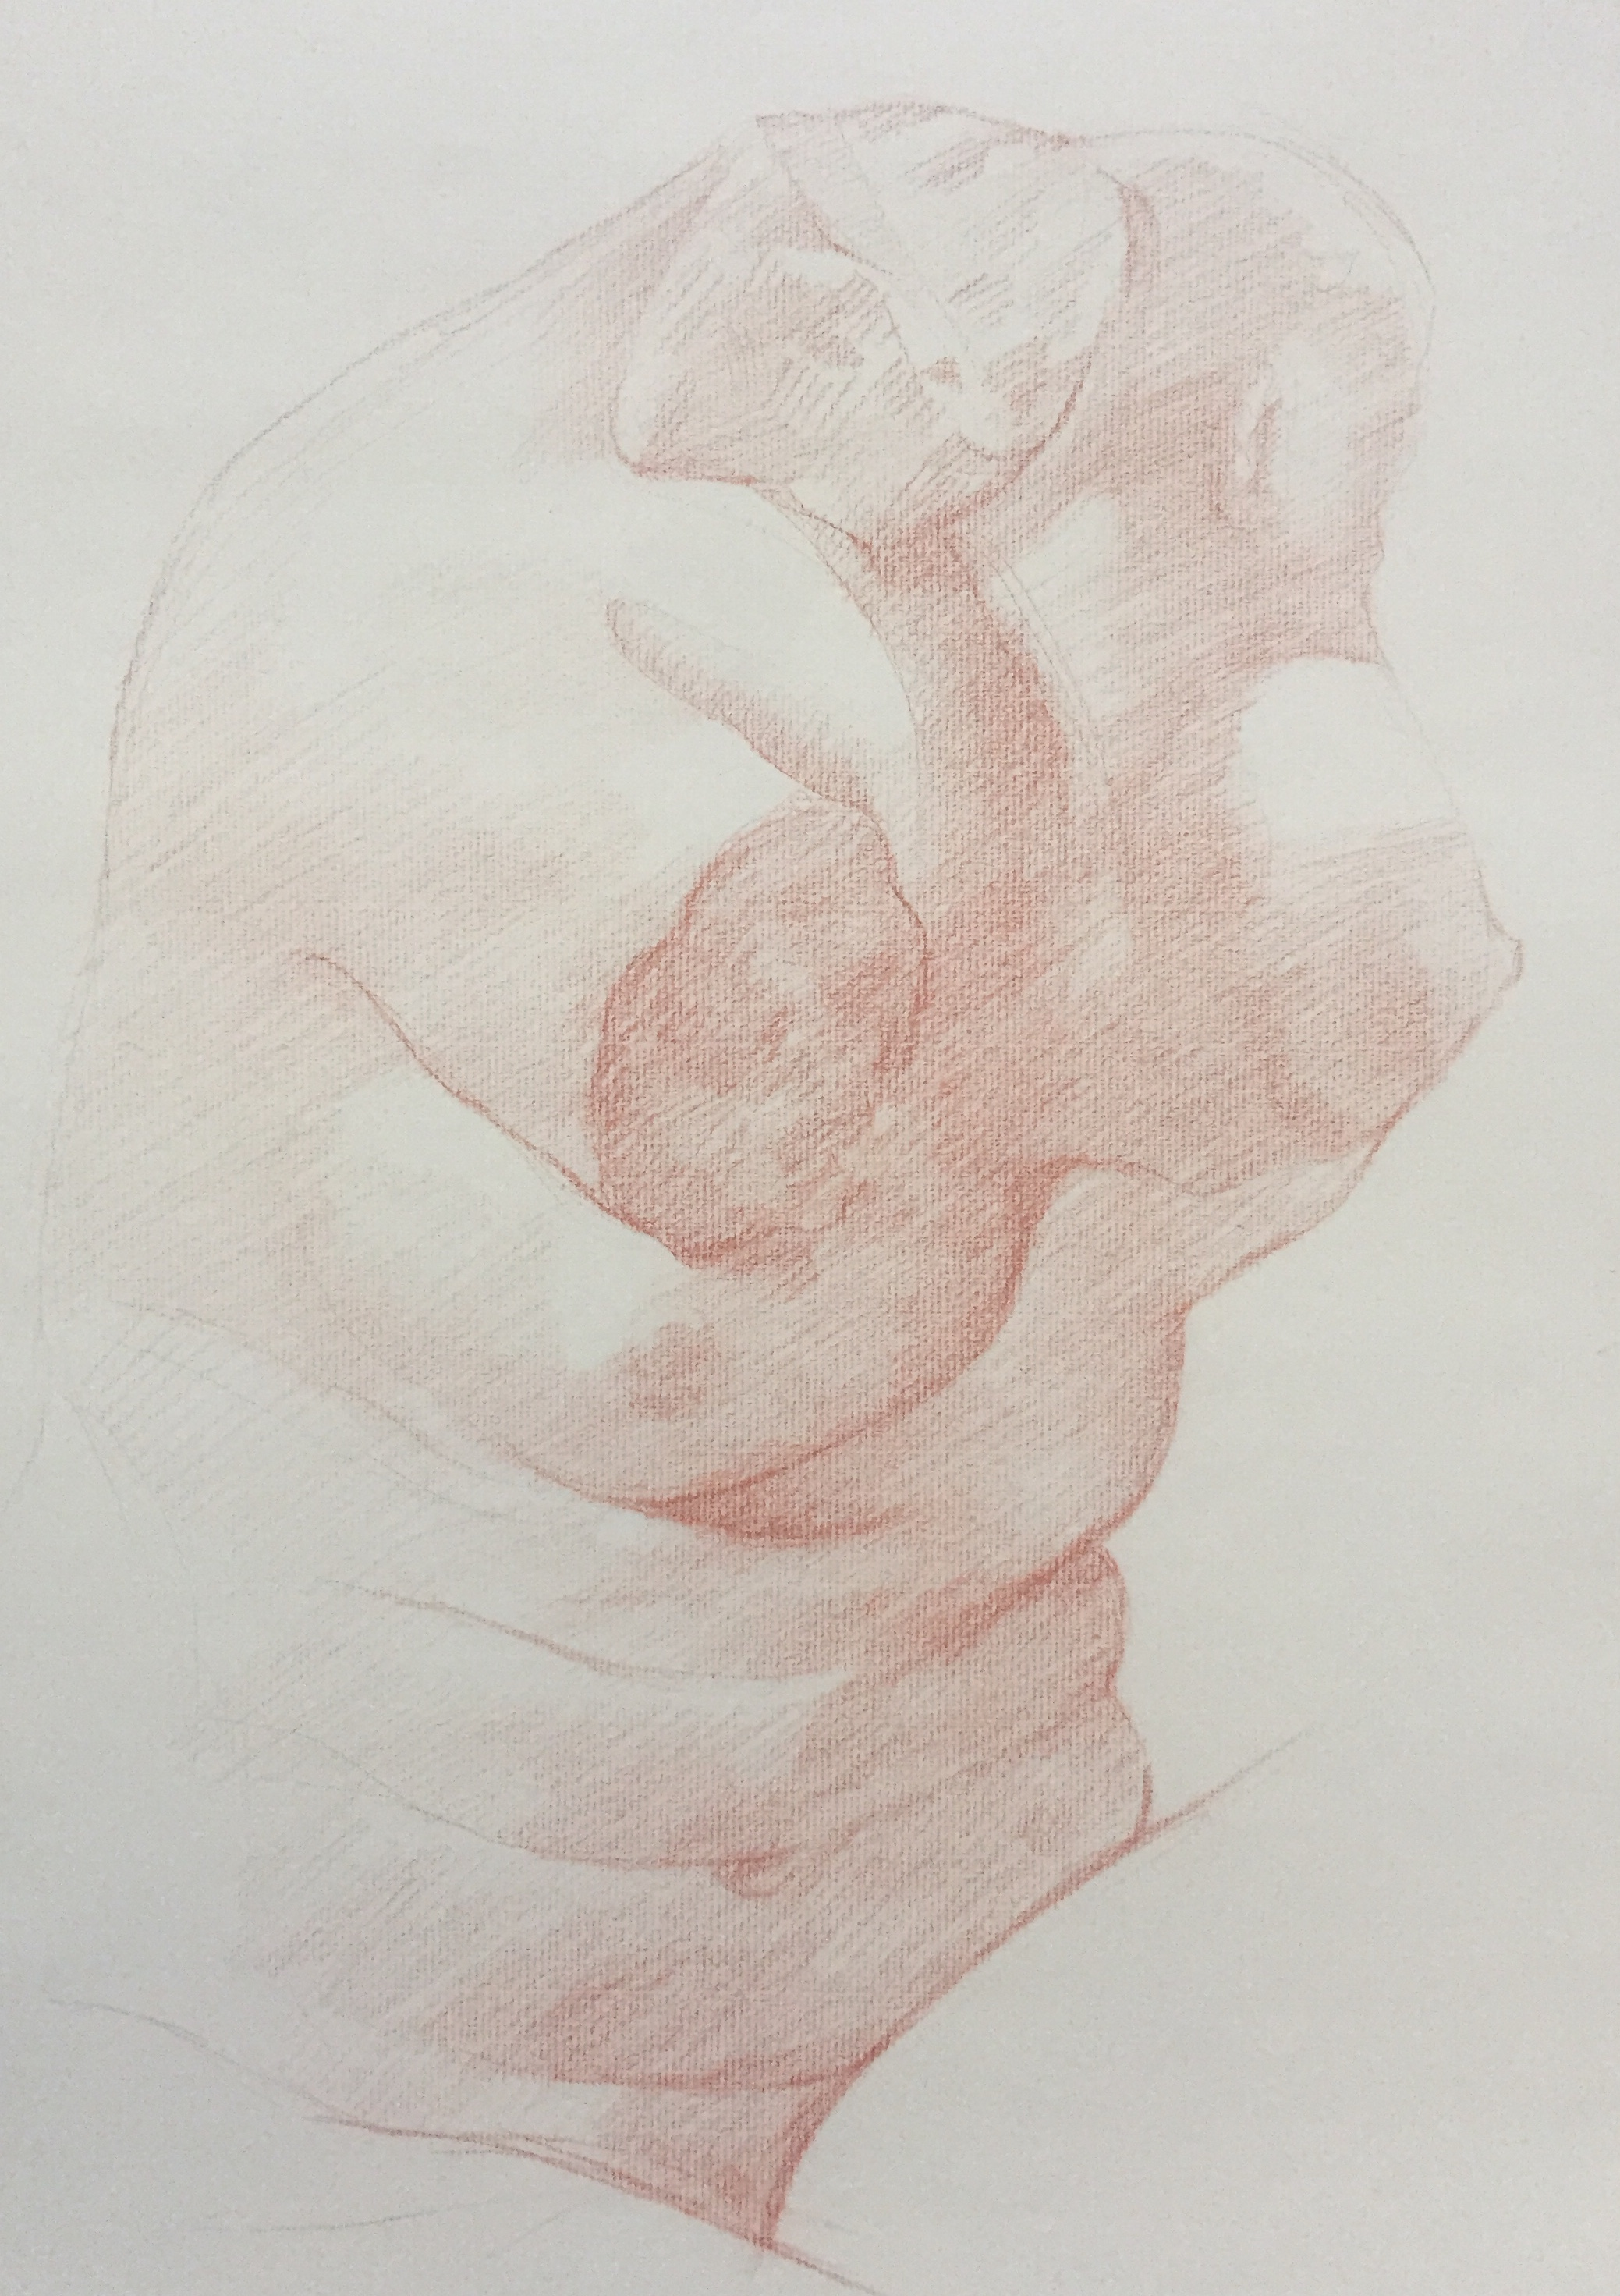 Aphrodite accroupie sanguine et crayon blanc